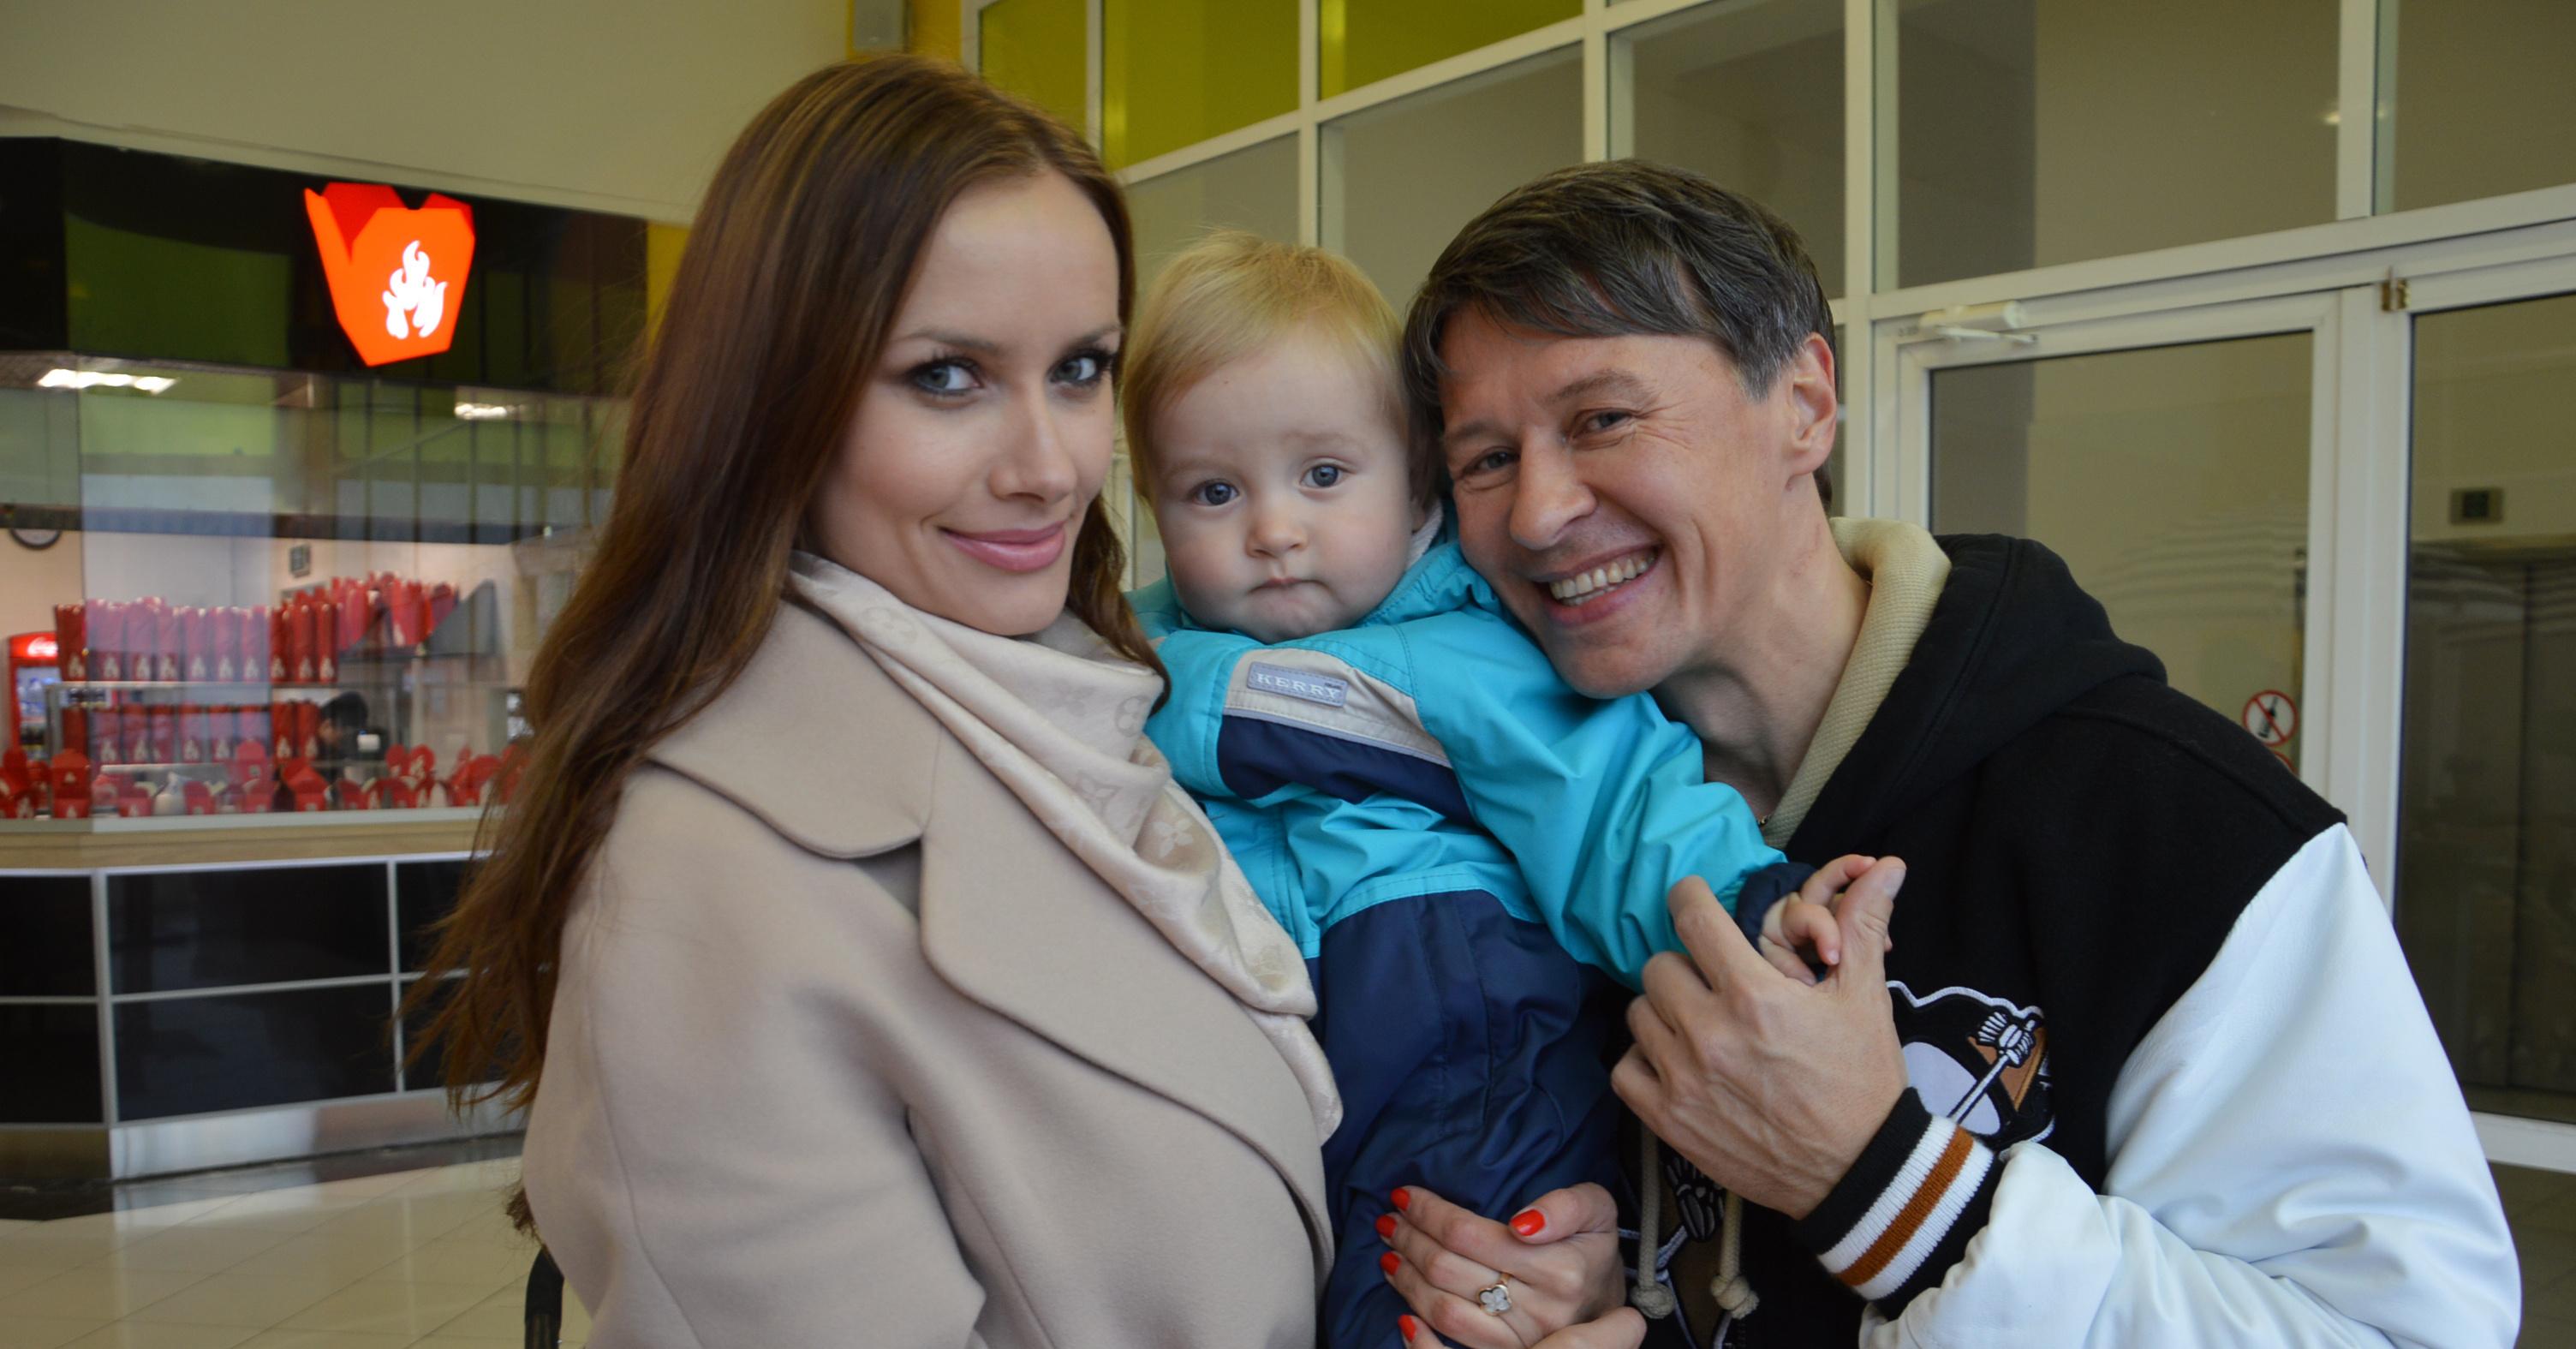 Андреи соколов жена и дети фото